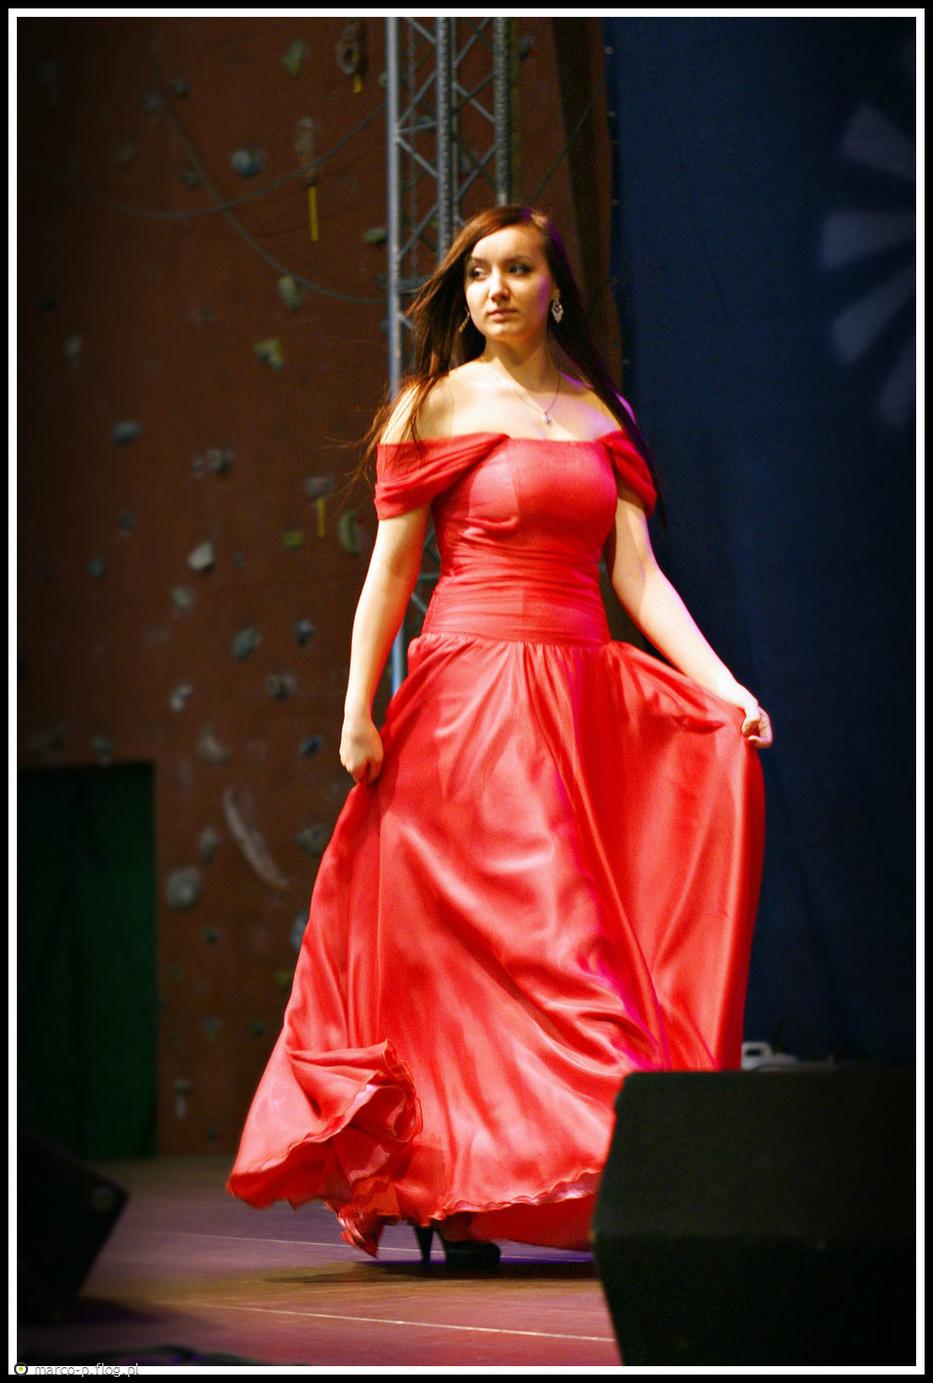 f095e454e0 Tag  gala ślubna stroje wizytowe red - Archiwum fotobloga marco-p ...